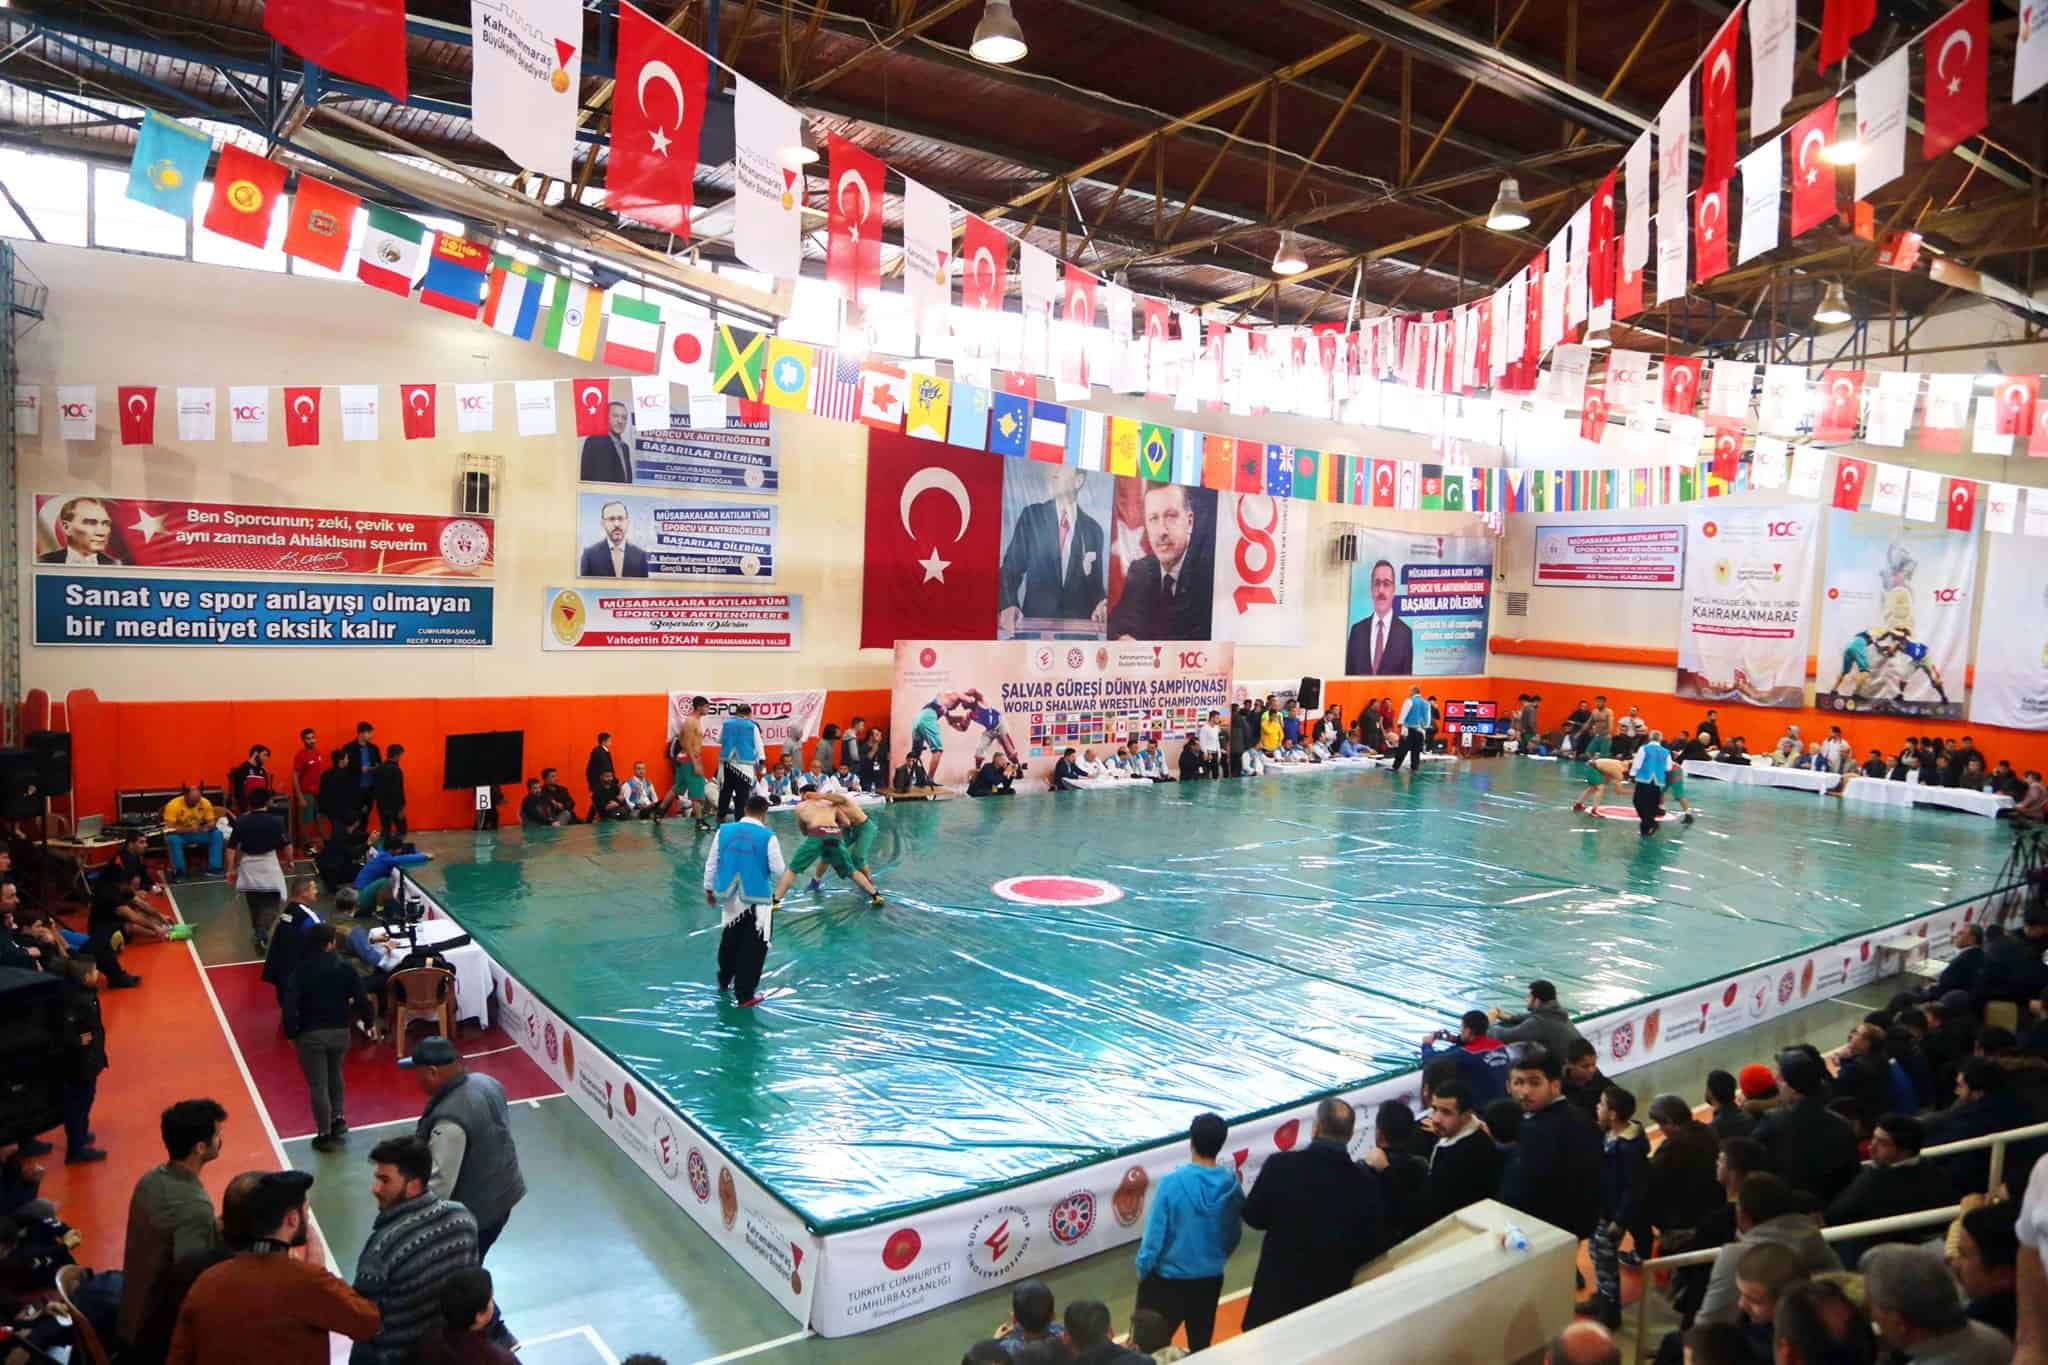 Shalwar wrestling world Championships 2020 3